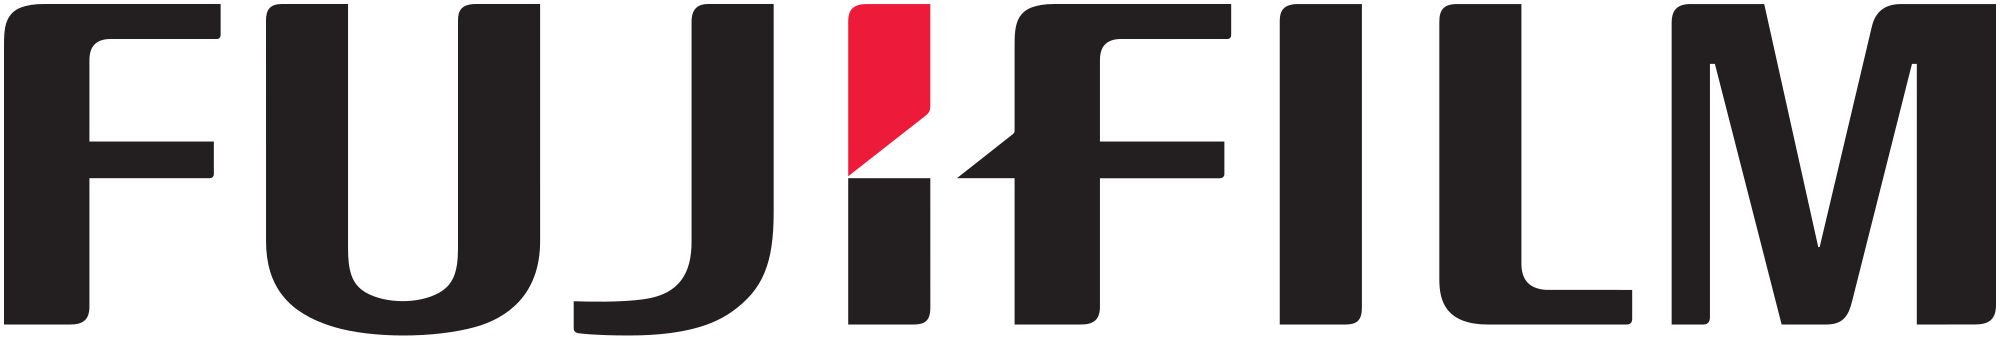 fujifilmlogo.png